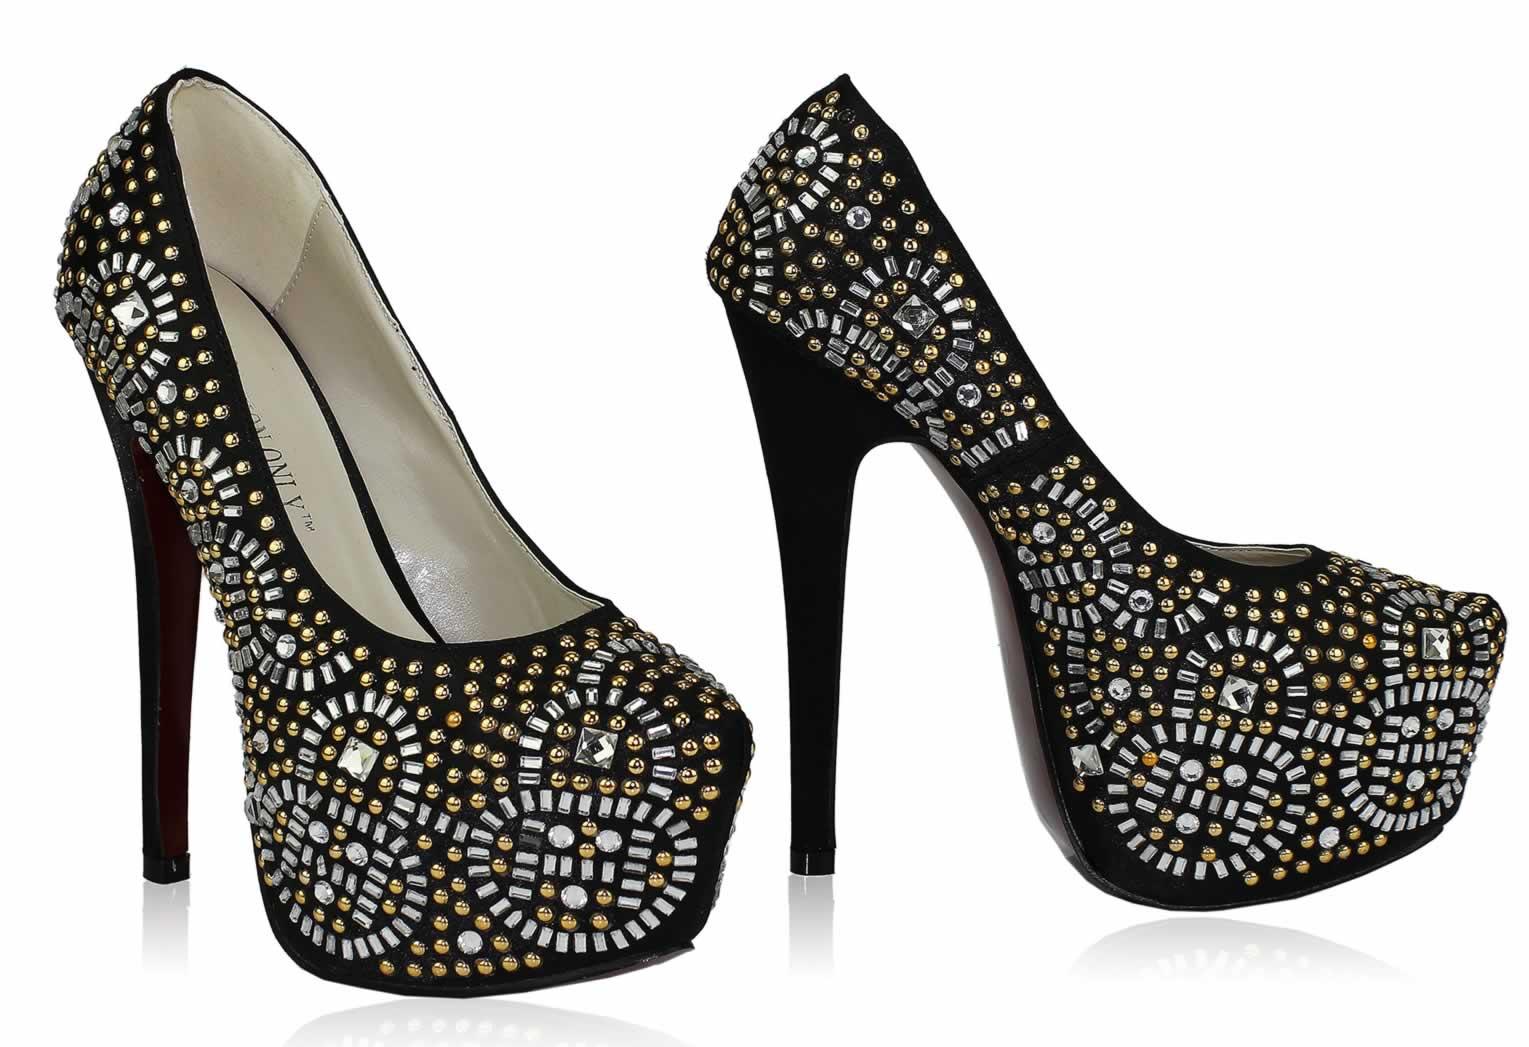 Wholesale Shoes    LSS00117 - Wholesale Shoes -- Black Studded Platform  Shoes - Ladies handbags, clutch bags and fashion accessories ab70dd6373